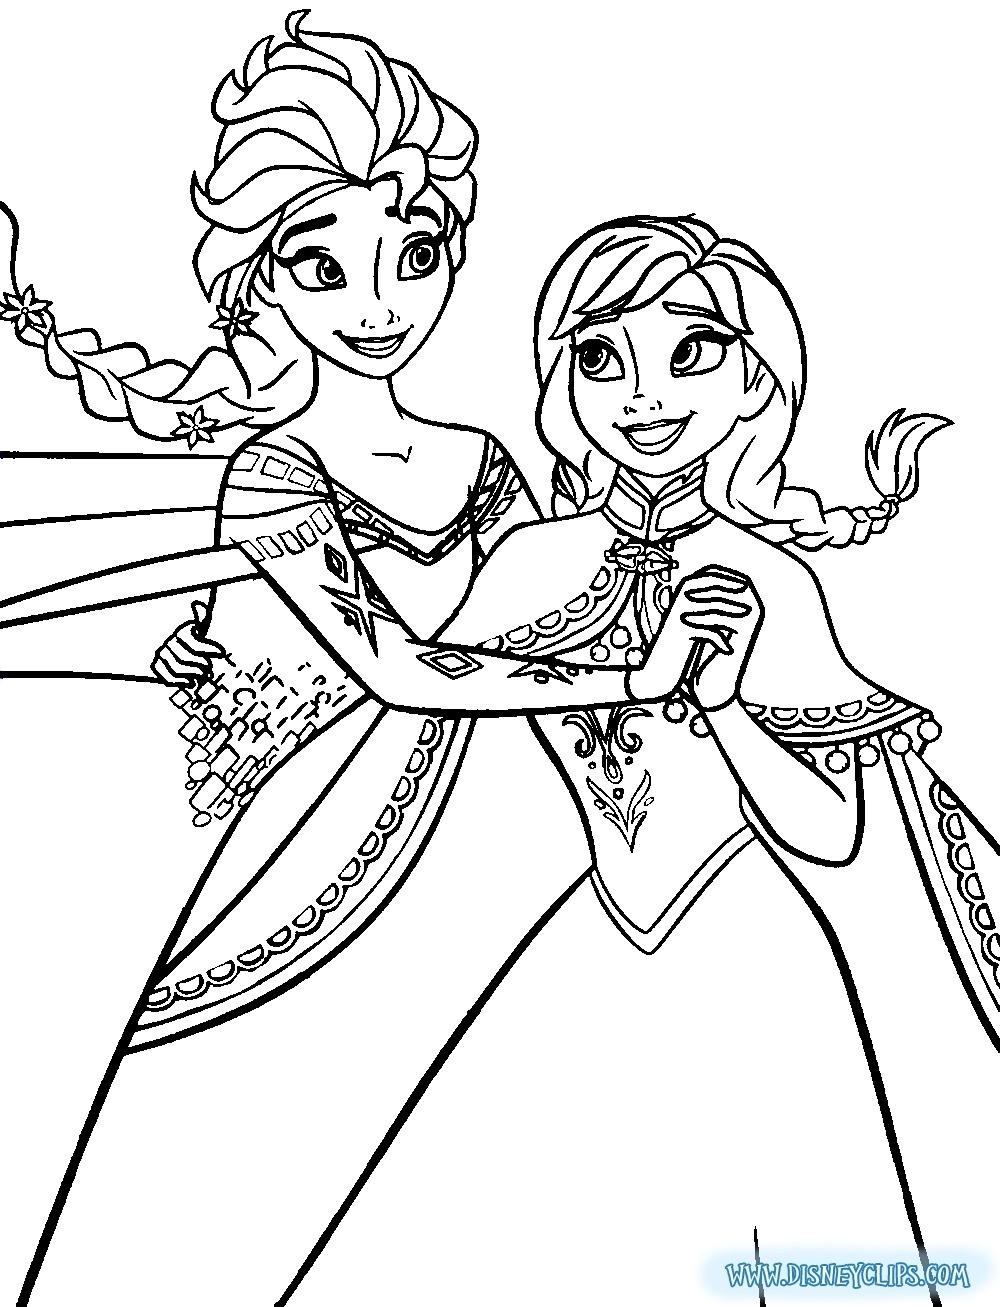 New Elsa And Anna Coloring Pages Disney Frozen Printable Coloring - Free Printable Coloring Pages Disney Frozen